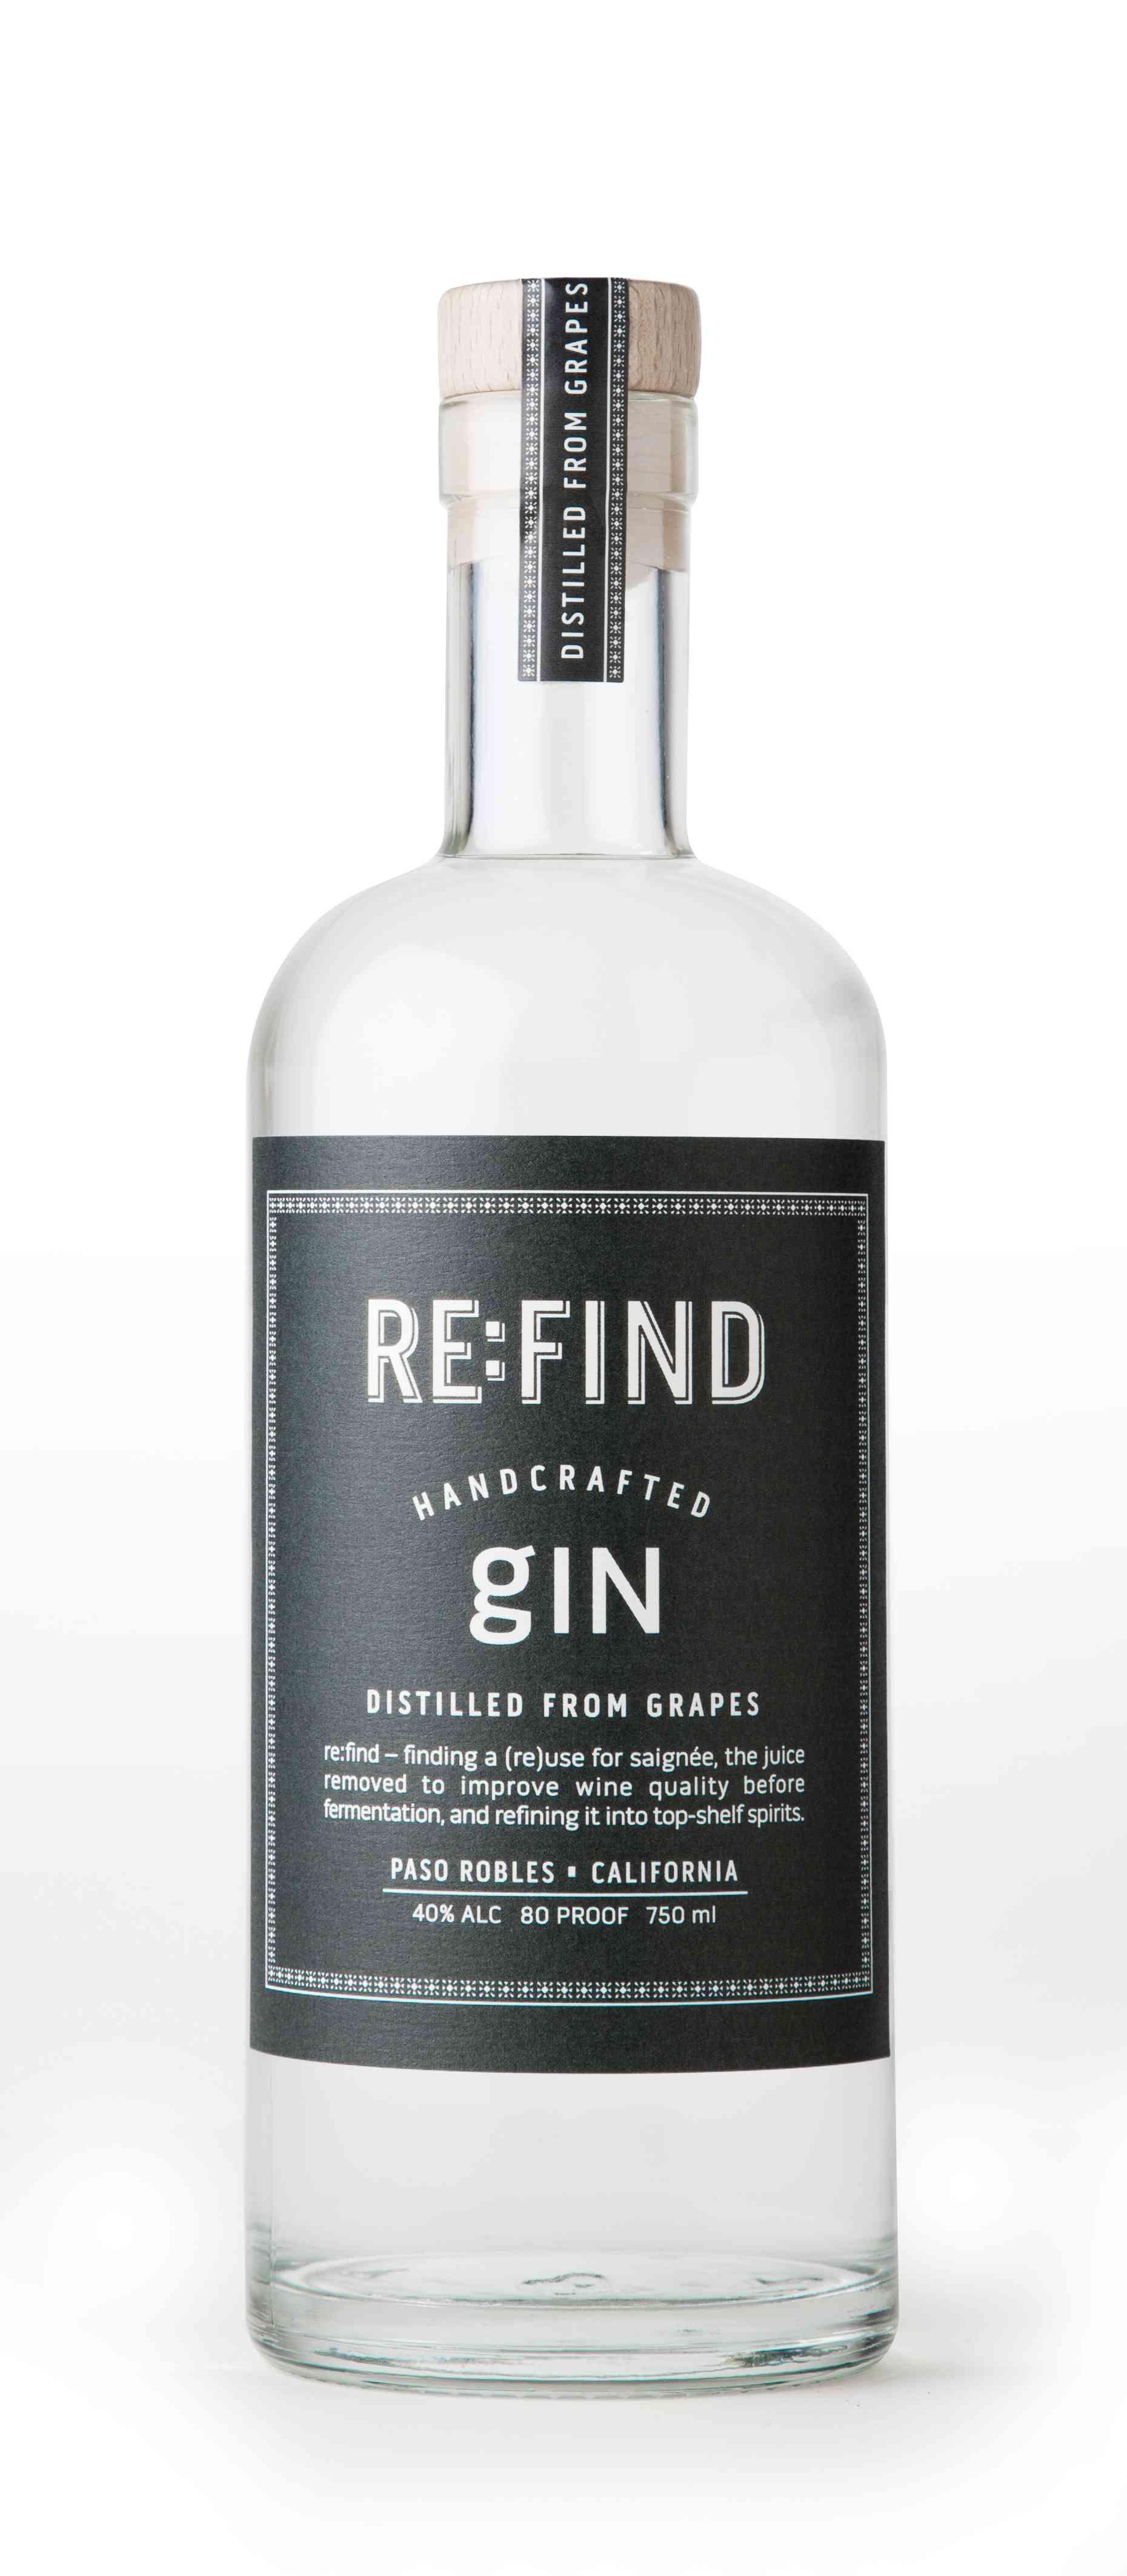 Bottle of Re:Find Gin